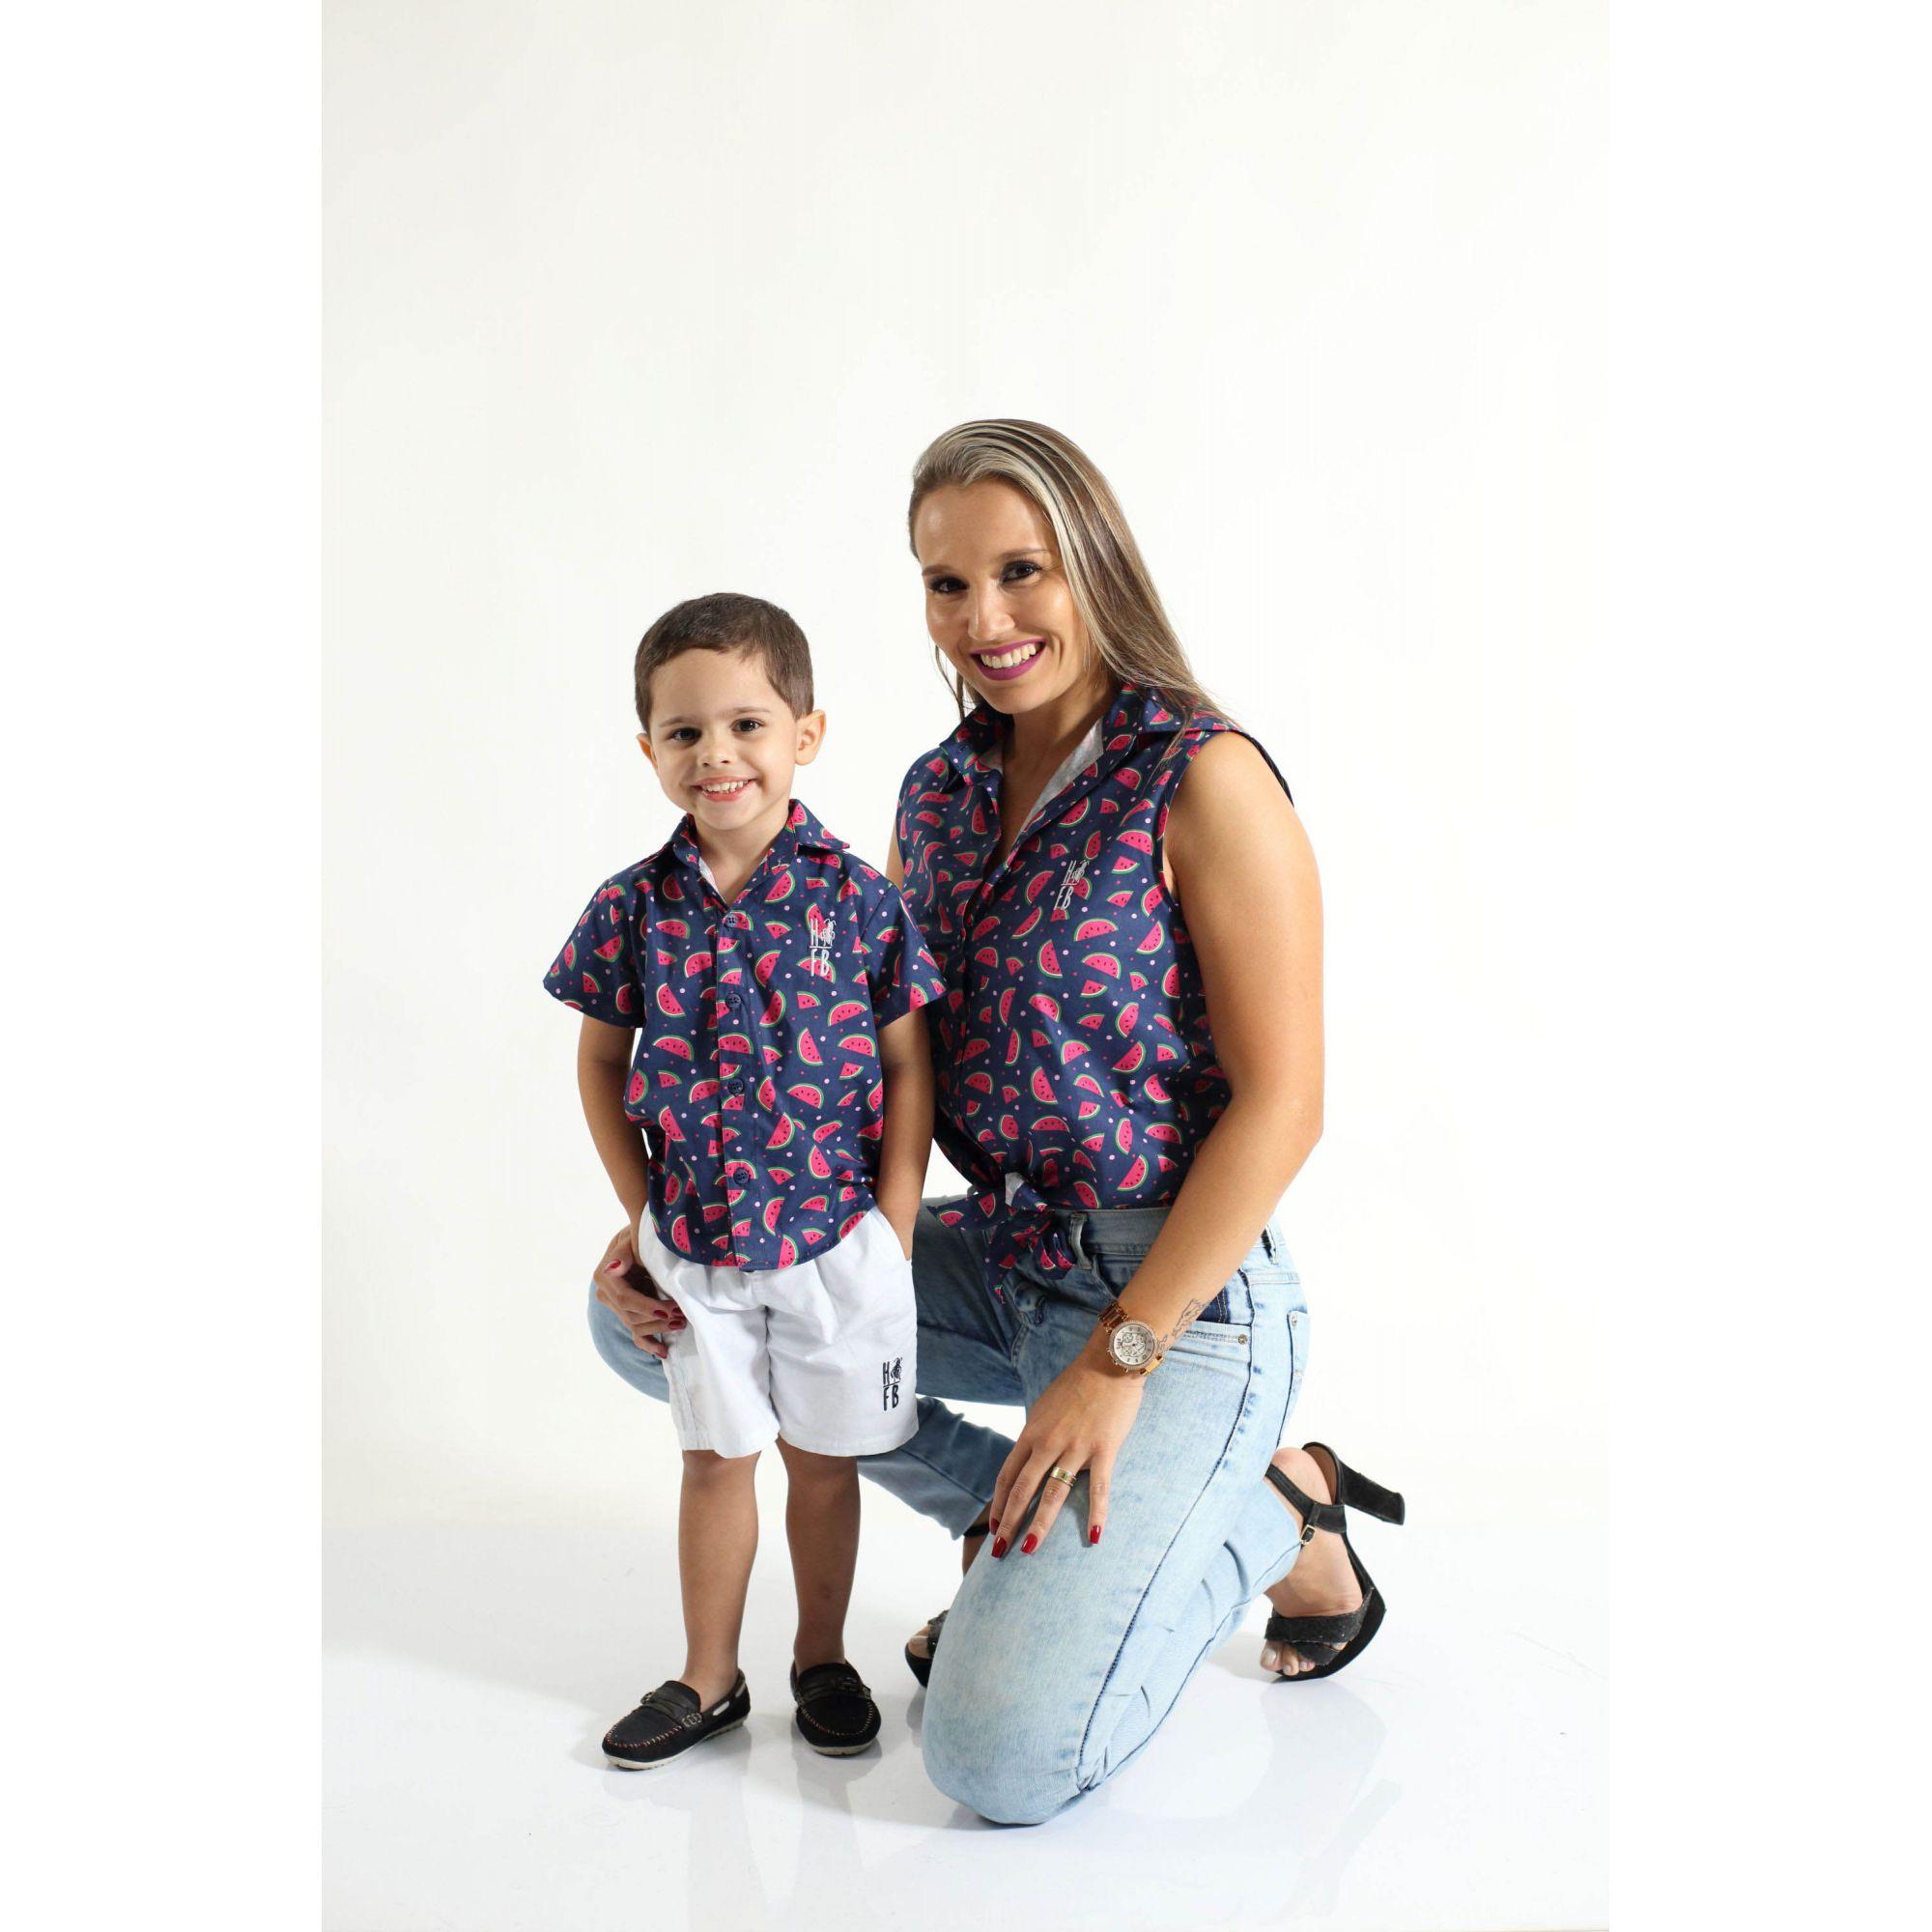 MÃE E FILHO > Kit 02 Camisas Social Adulto e Infantil Melancia [Coleção Tal Mãe Tal Filho]